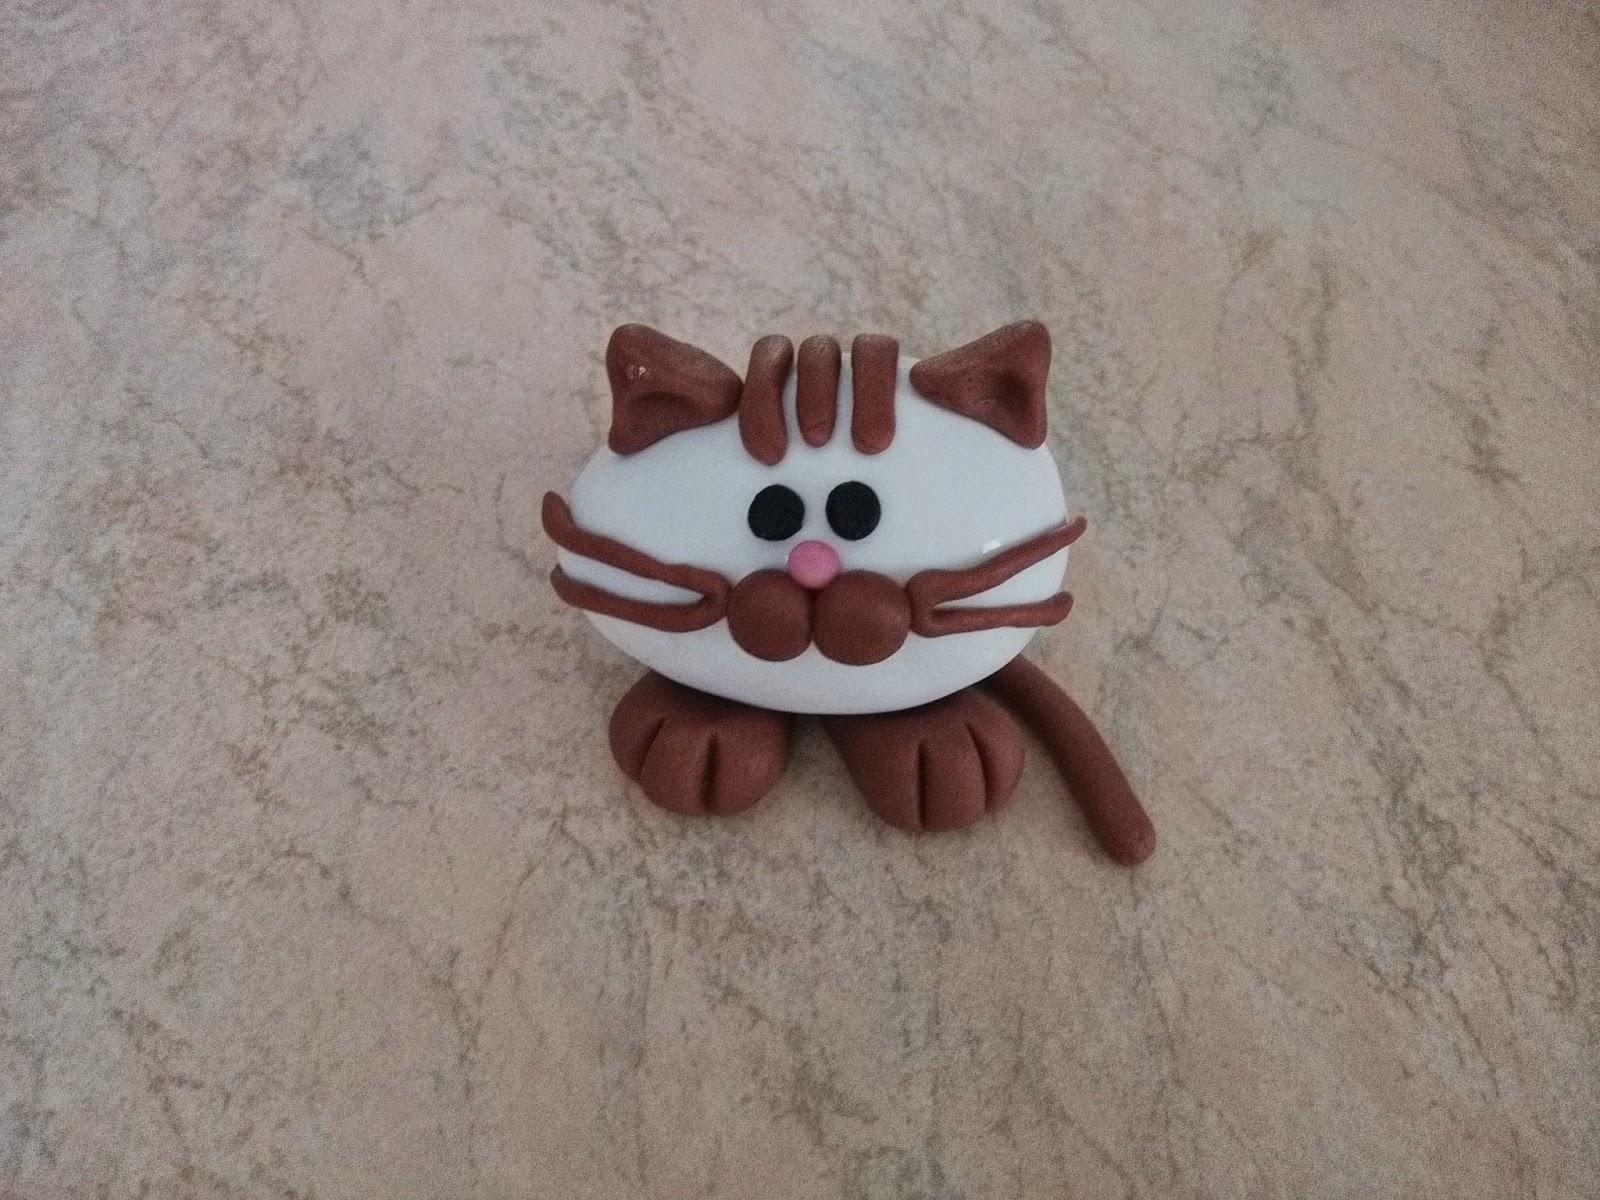 Dodicesimo uovo: i gatti